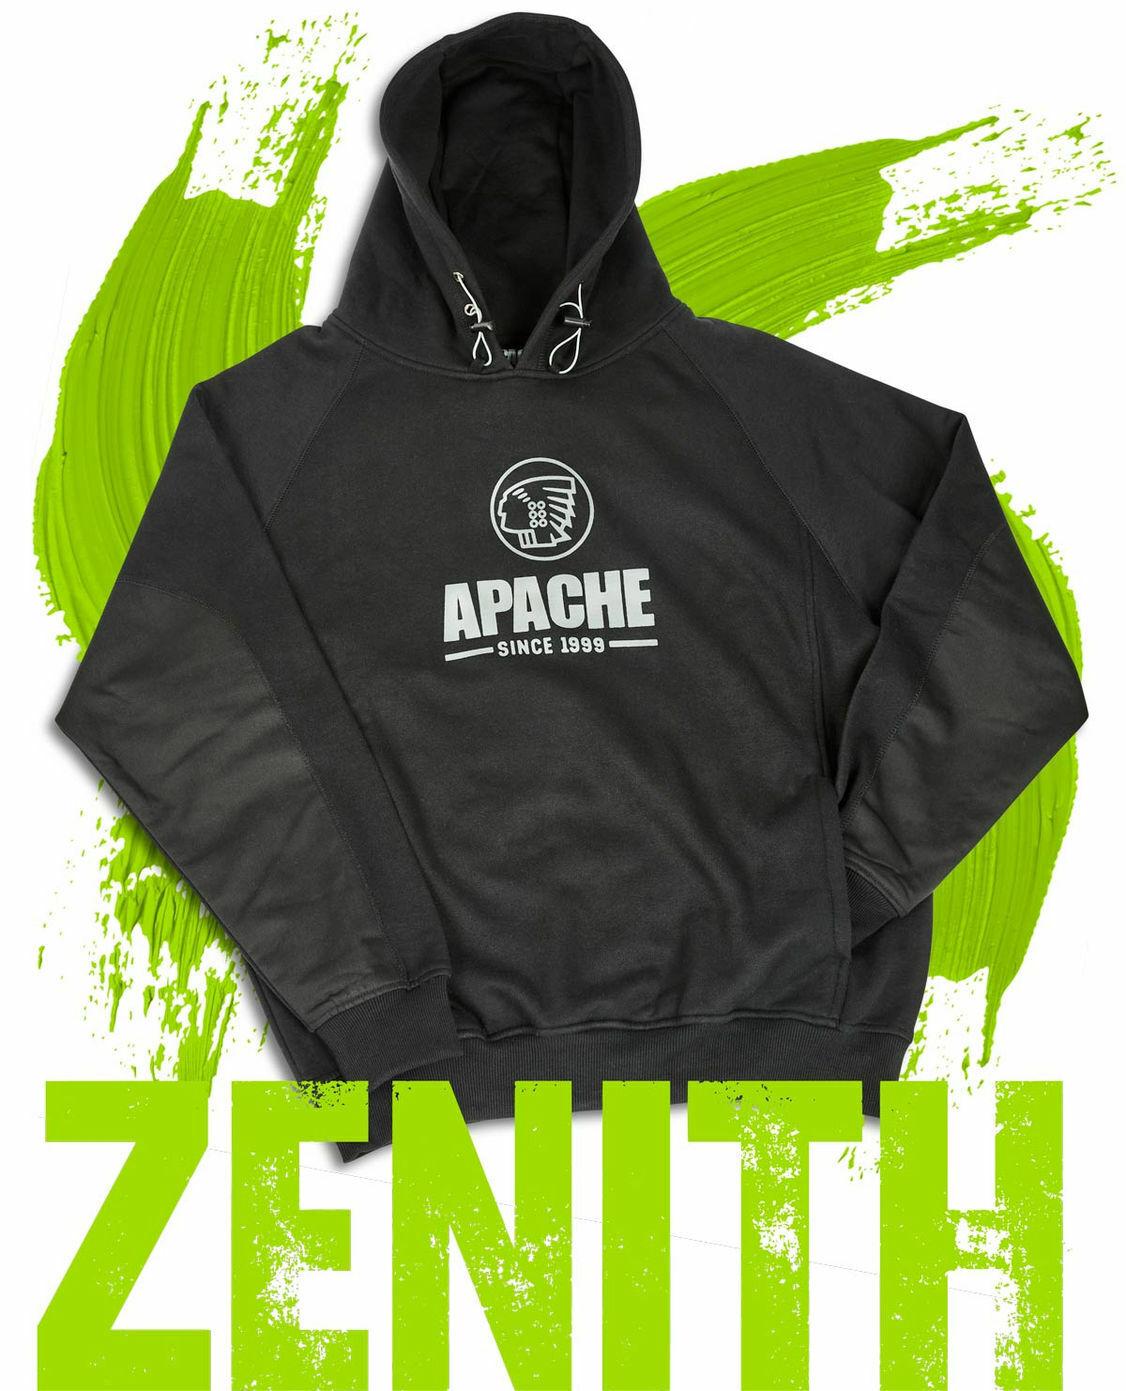 Apache Zenith Heavyweight Mens Hooded Sweatshirt Hoody Workwear Top Jumper